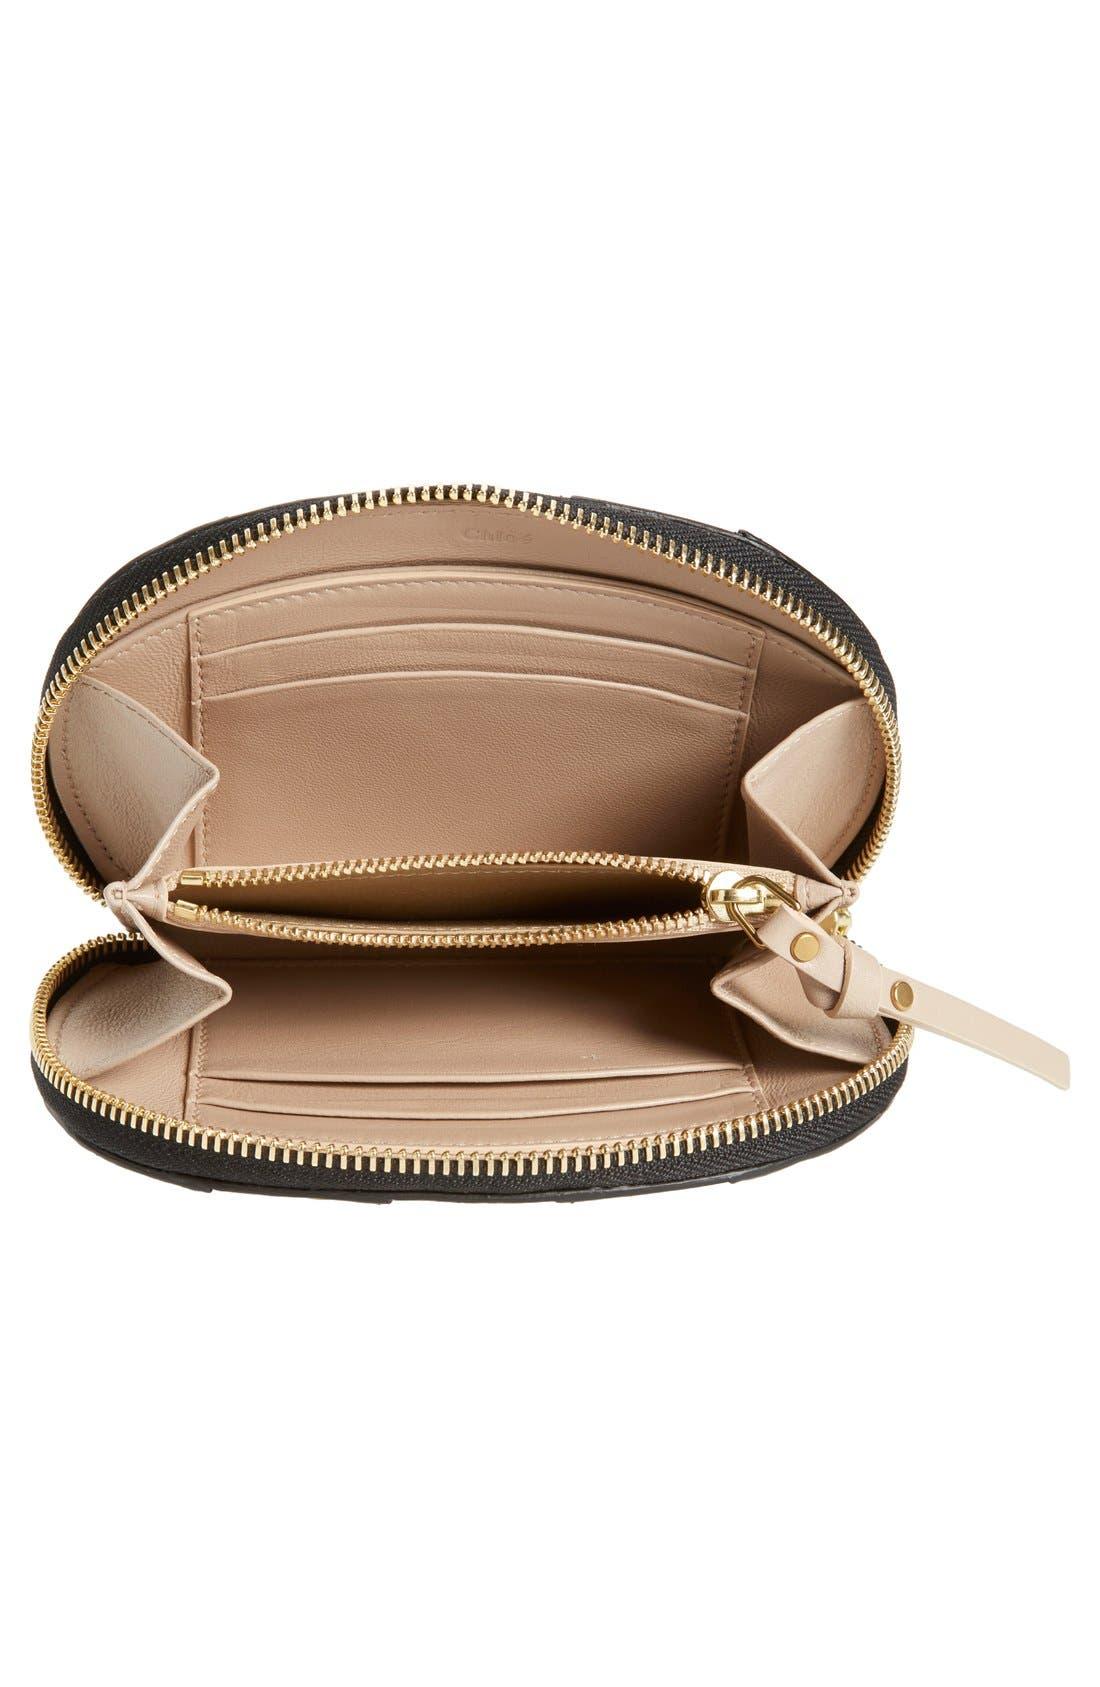 CHLOÉ,                             'Hayley' Zip Around Calfskin Leather Wallet,                             Alternate thumbnail 4, color,                             001